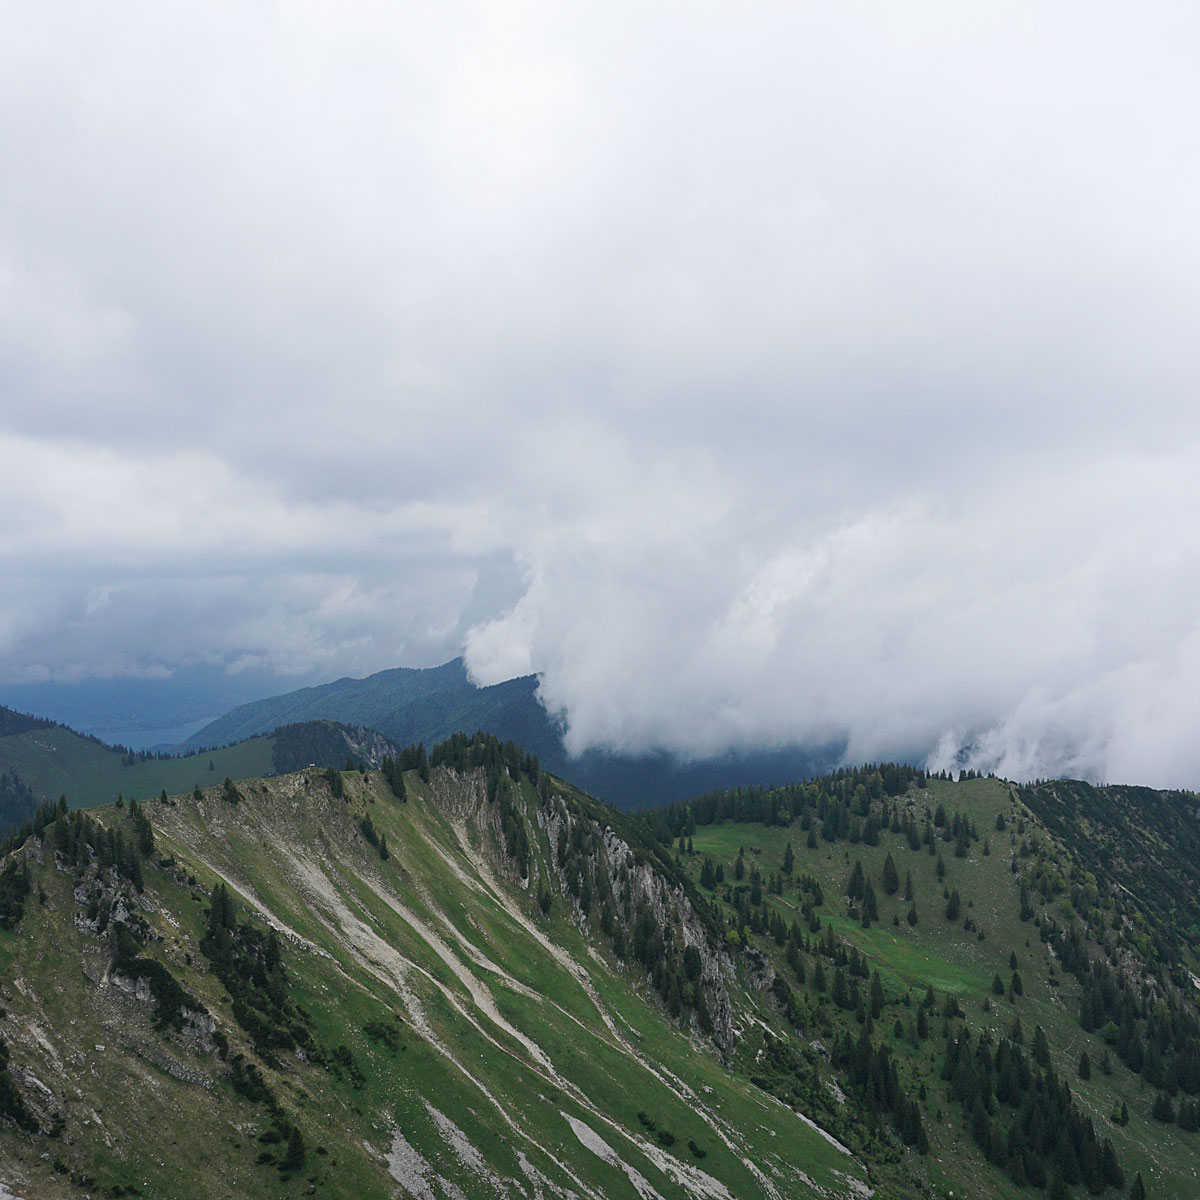 Artikelbild Spitzingsee Brecherspitze Regenwetter